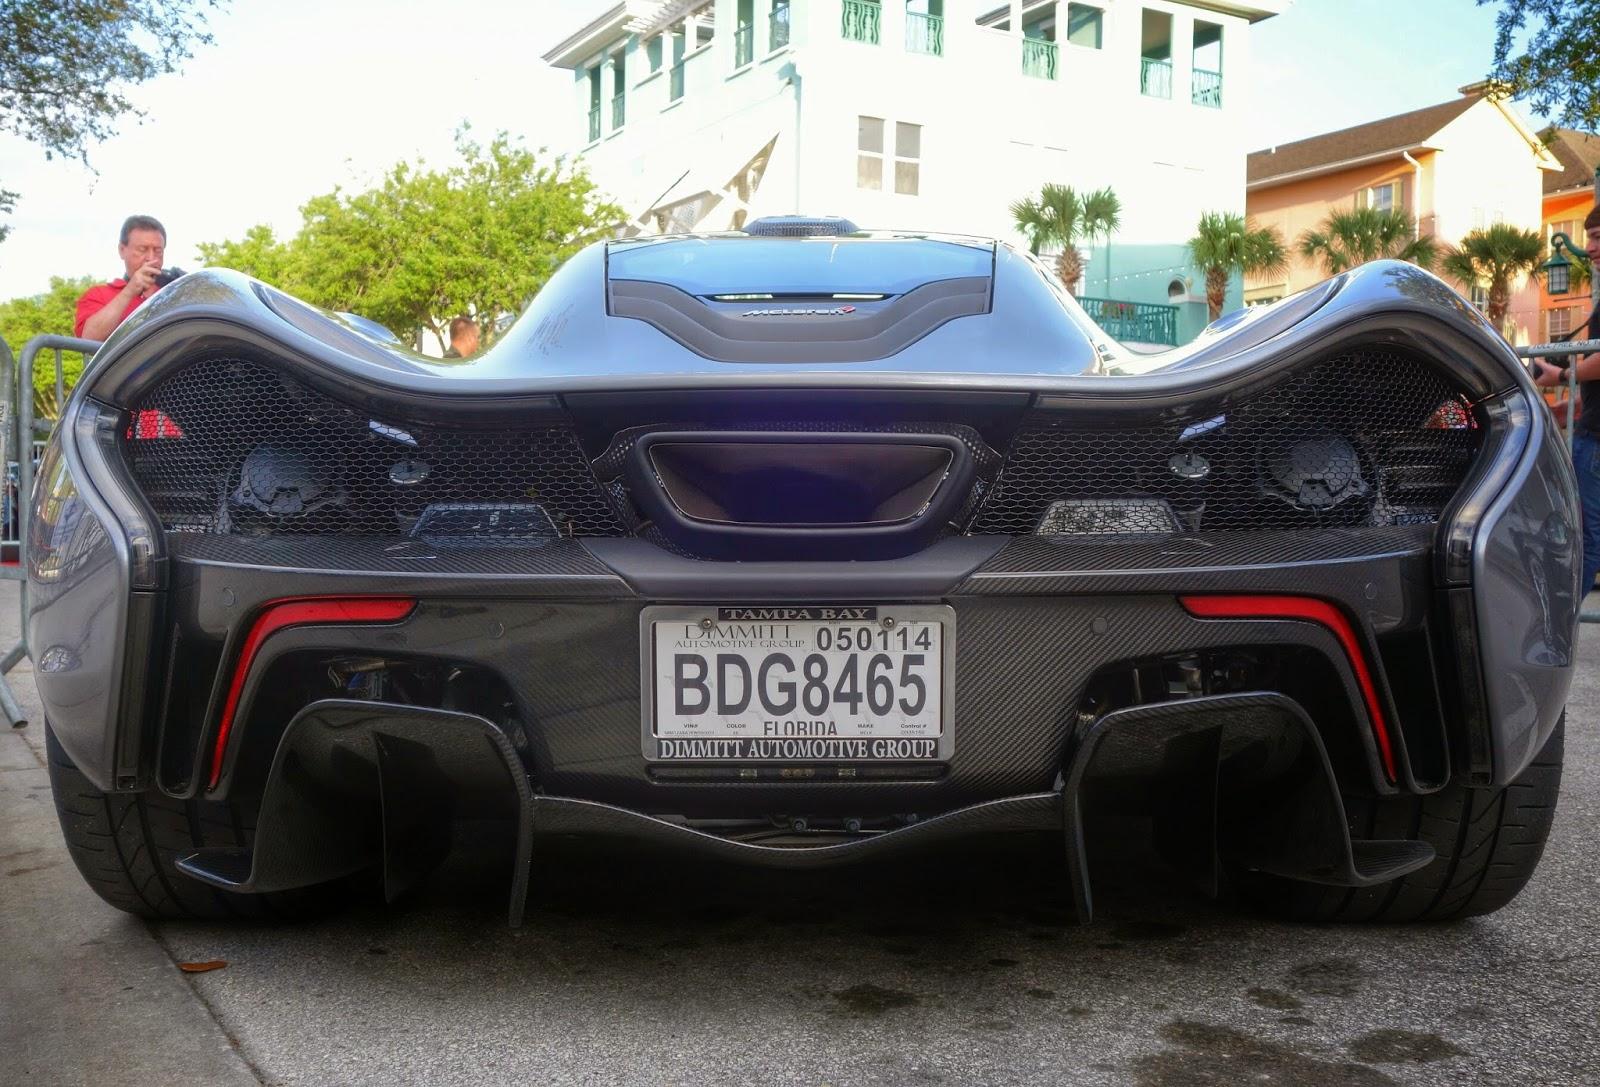 The Sexy Mclaren P1 Hot Supercars